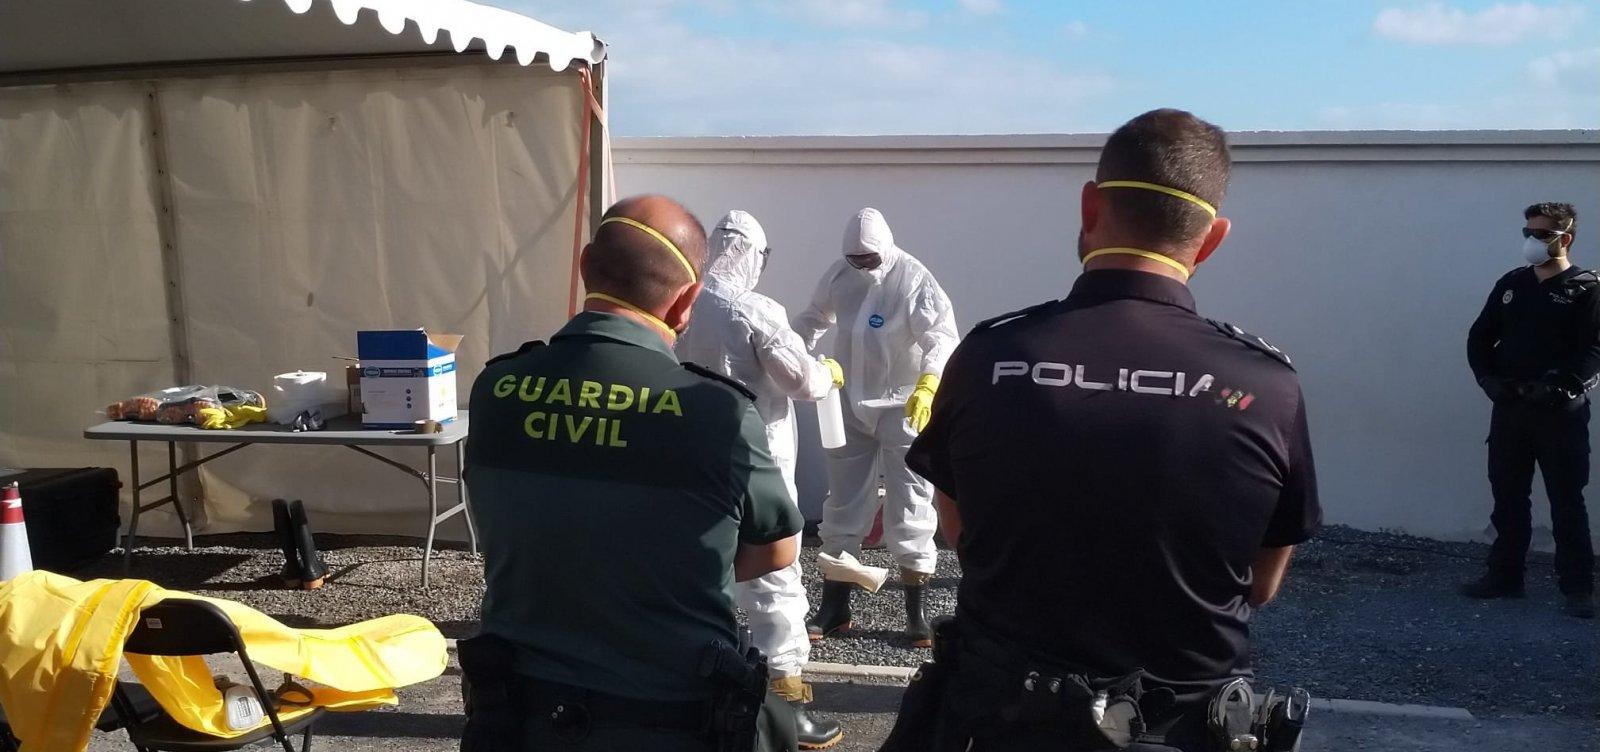 Novos surtos de coronavírus na Espanha geram temores de 'segunda onda' na Europa